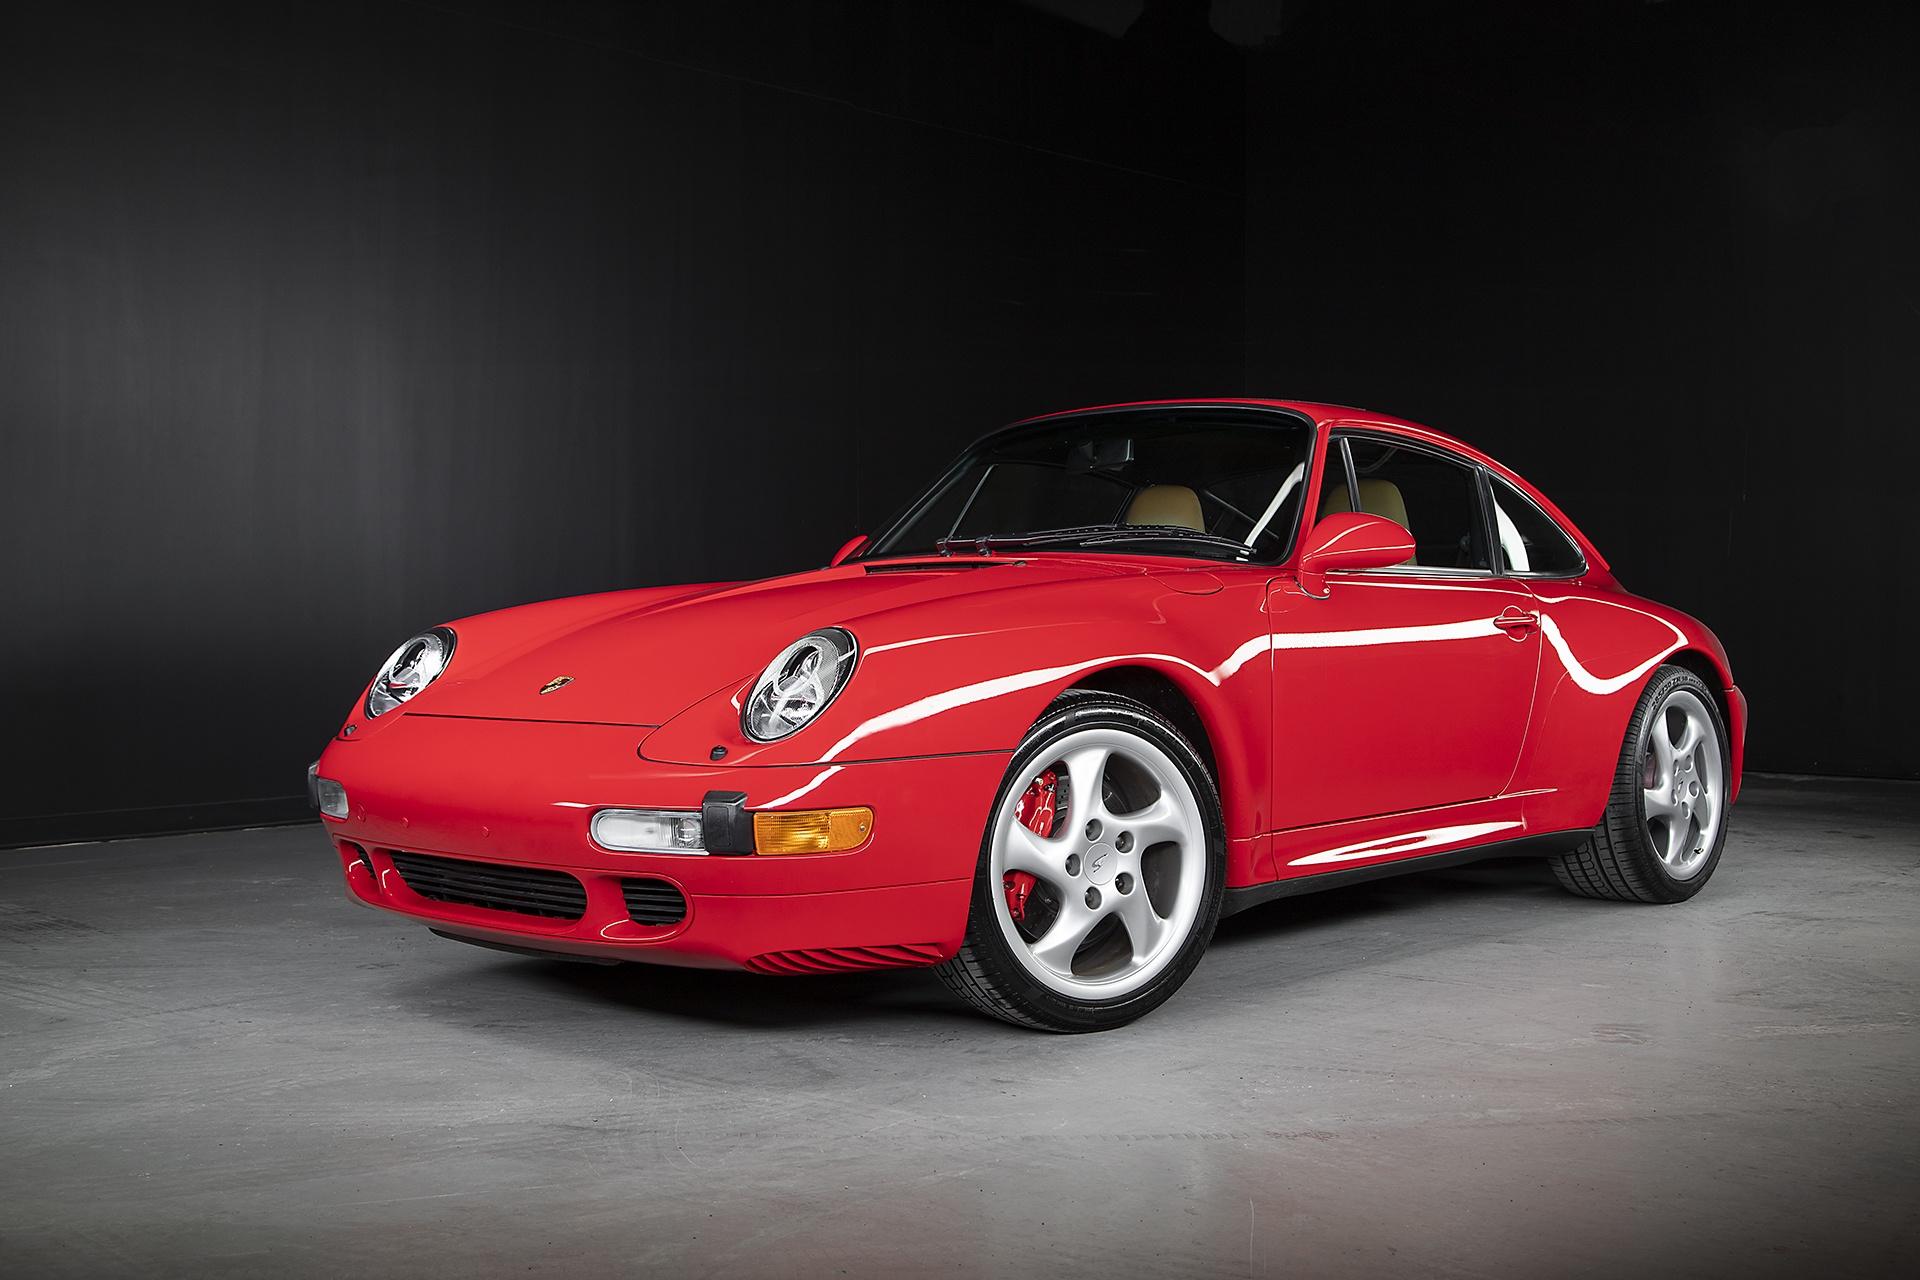 1996 Porsche 911 Carrera 4 S